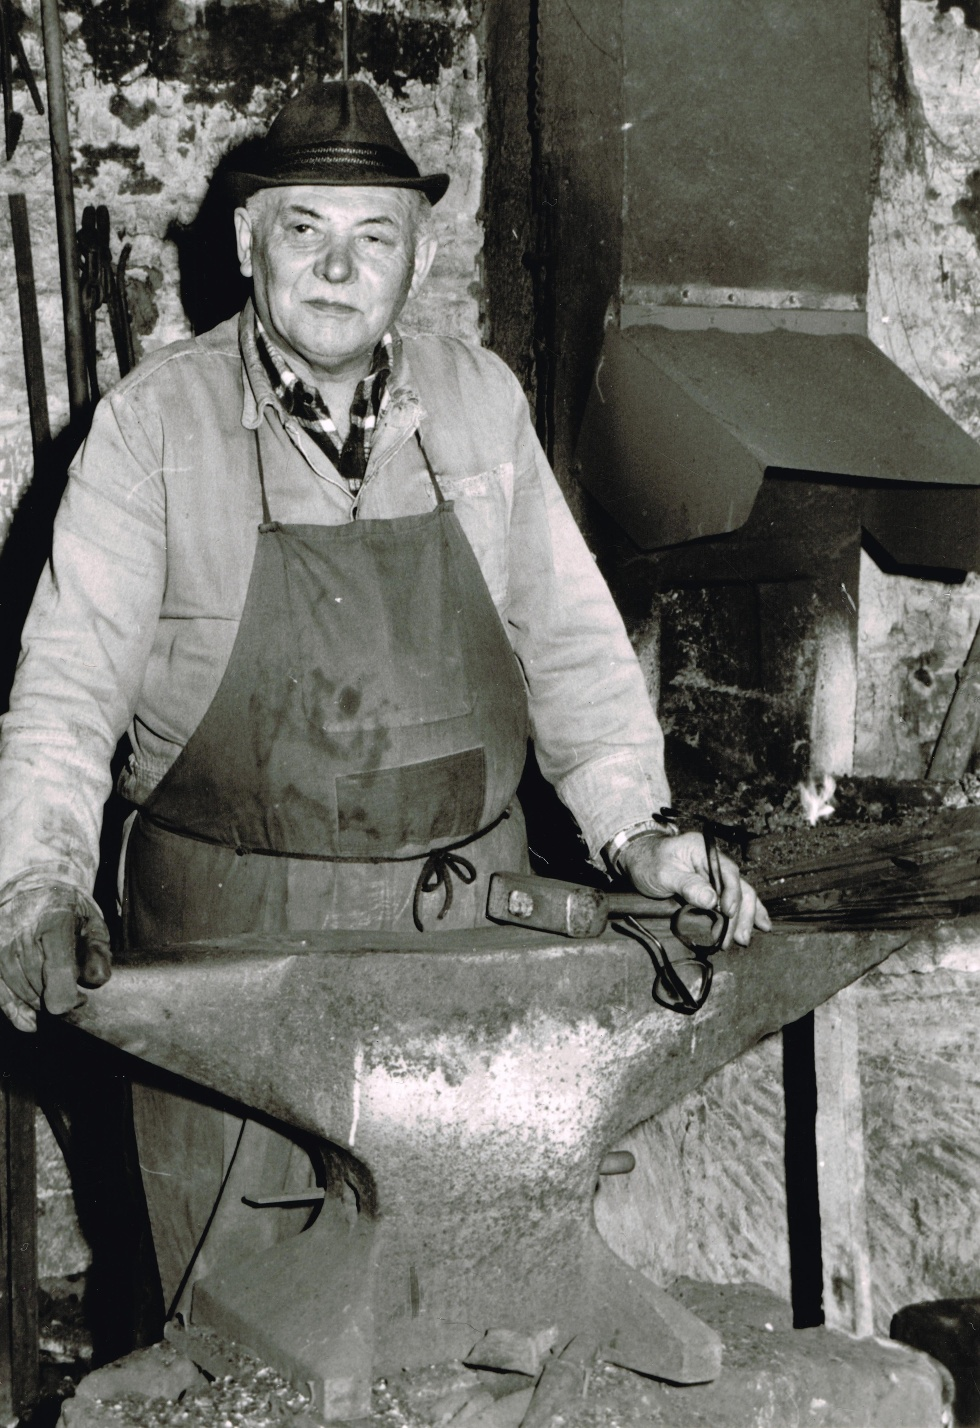 Reinhard Moser (1929 - 2015), Alte Schmiede Eppingen-Mühlbach